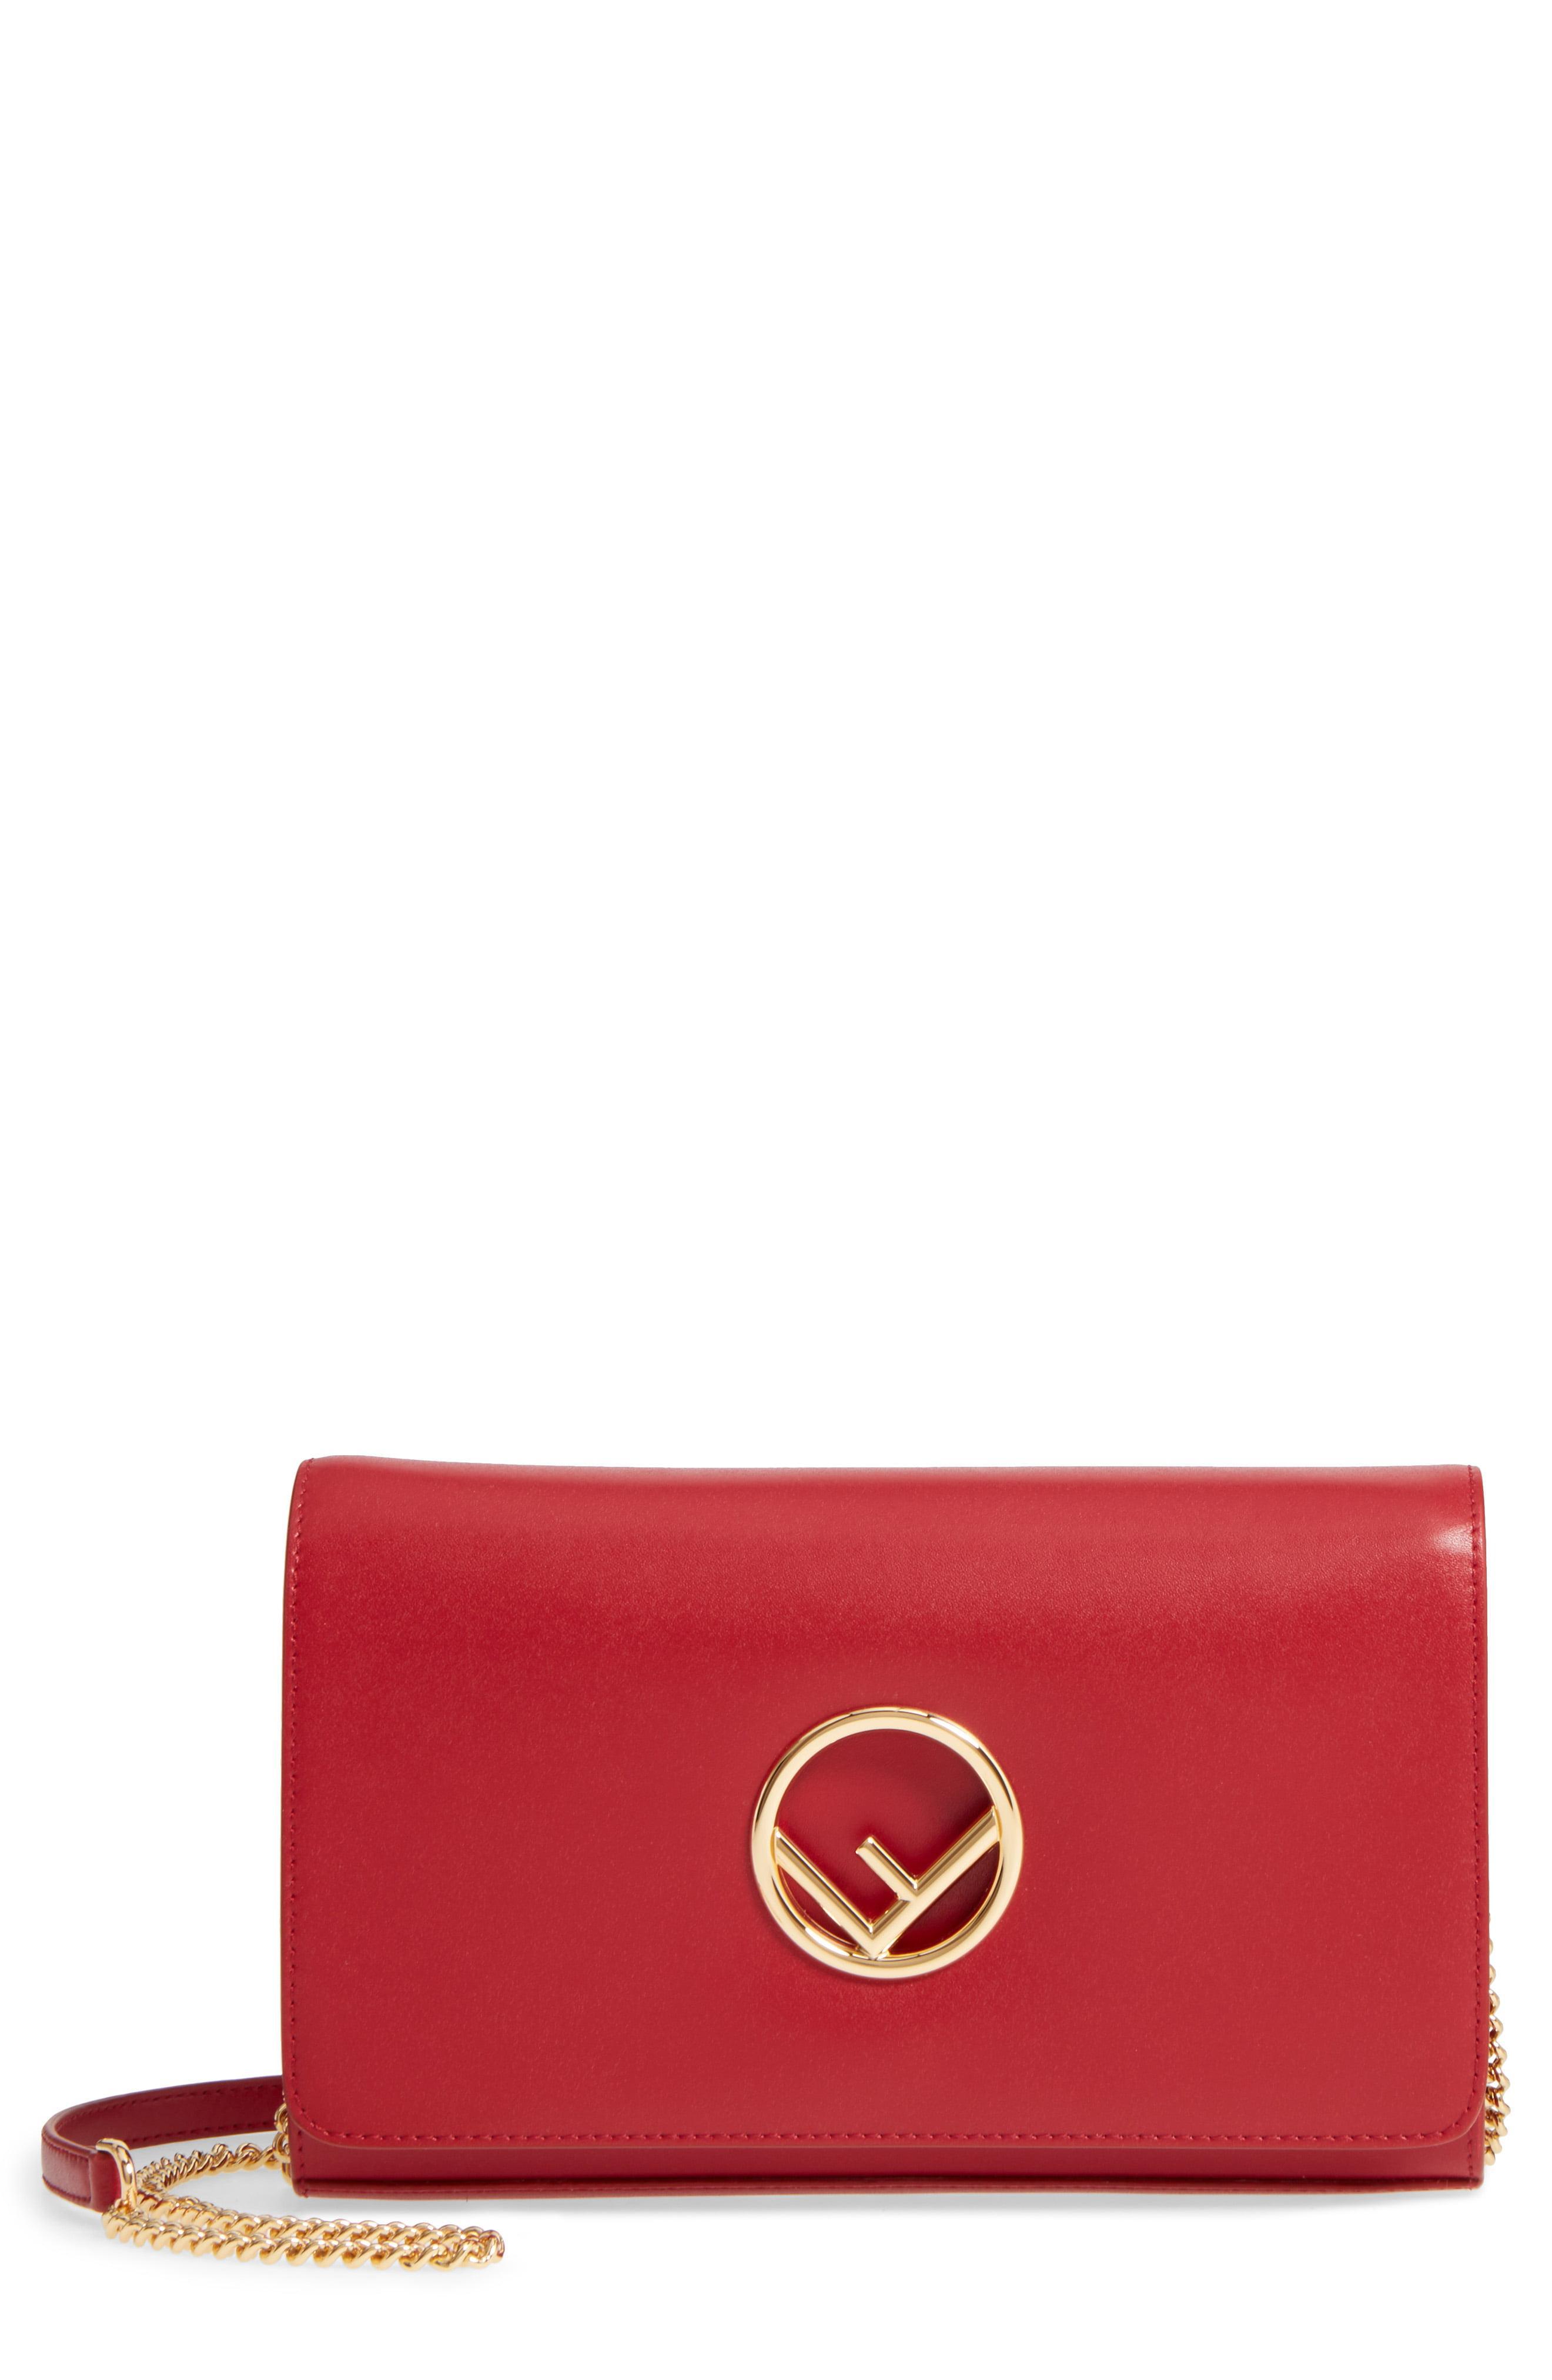 9157e2b55d74 Lyst - Fendi Liberty Logo Calfskin Leather Wallet On A Chain - in ...